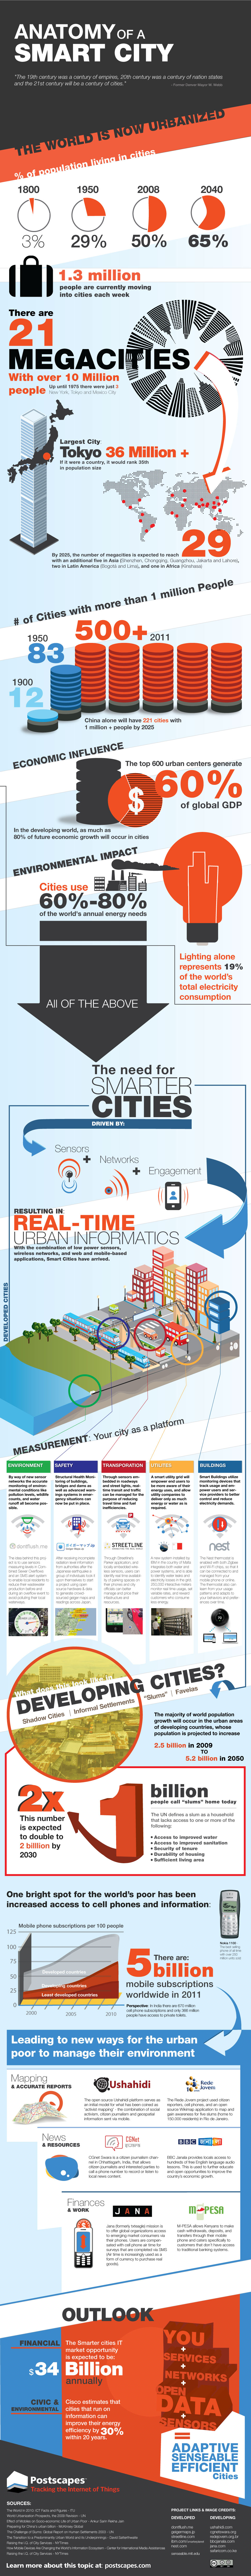 Smart City Anatomy Infographic